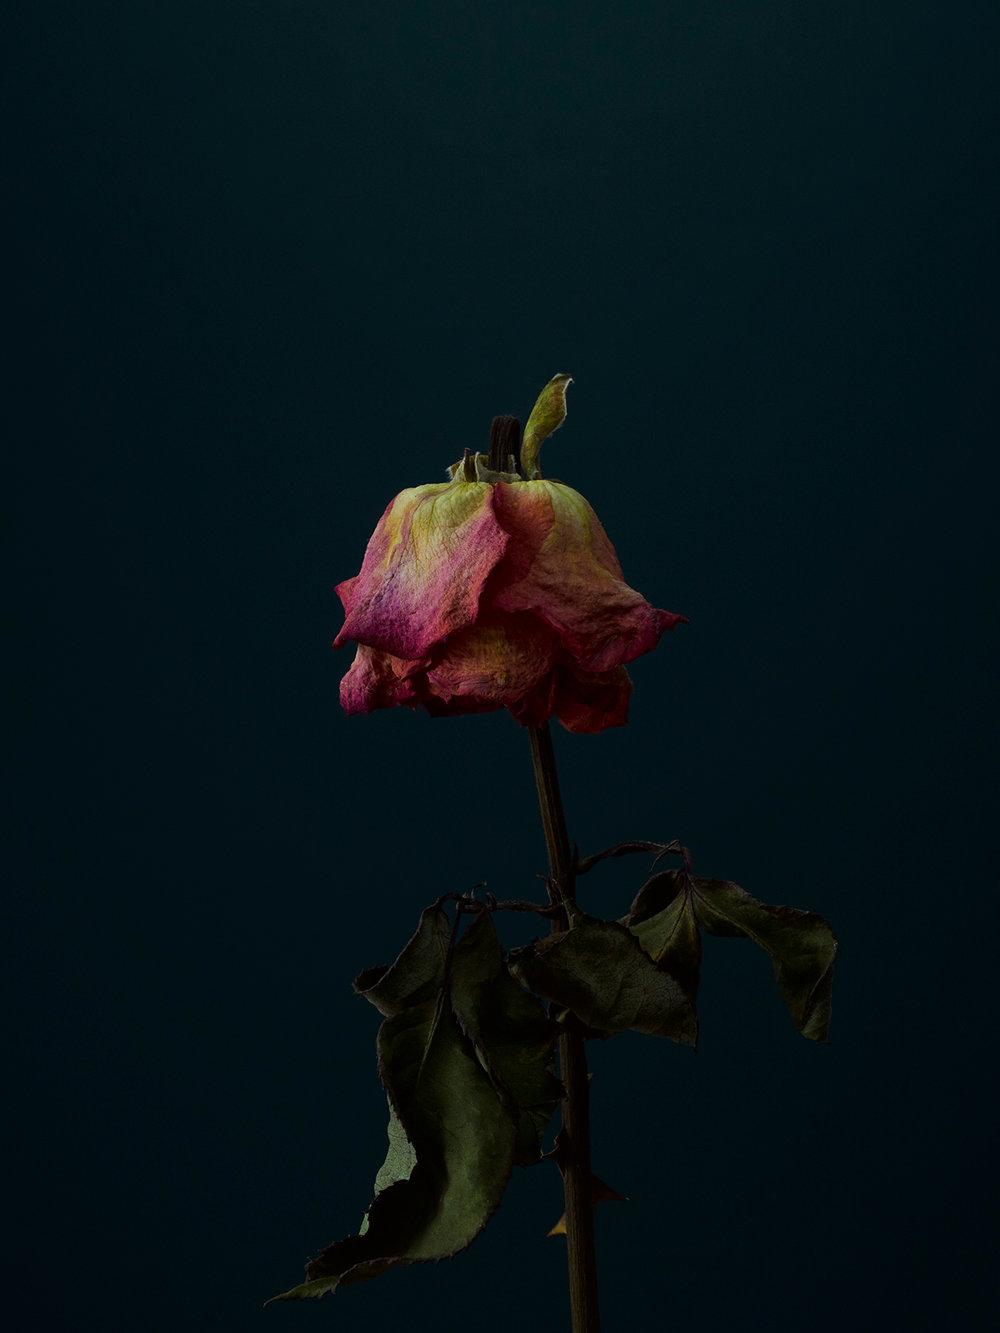 rose-6-copy.jpg